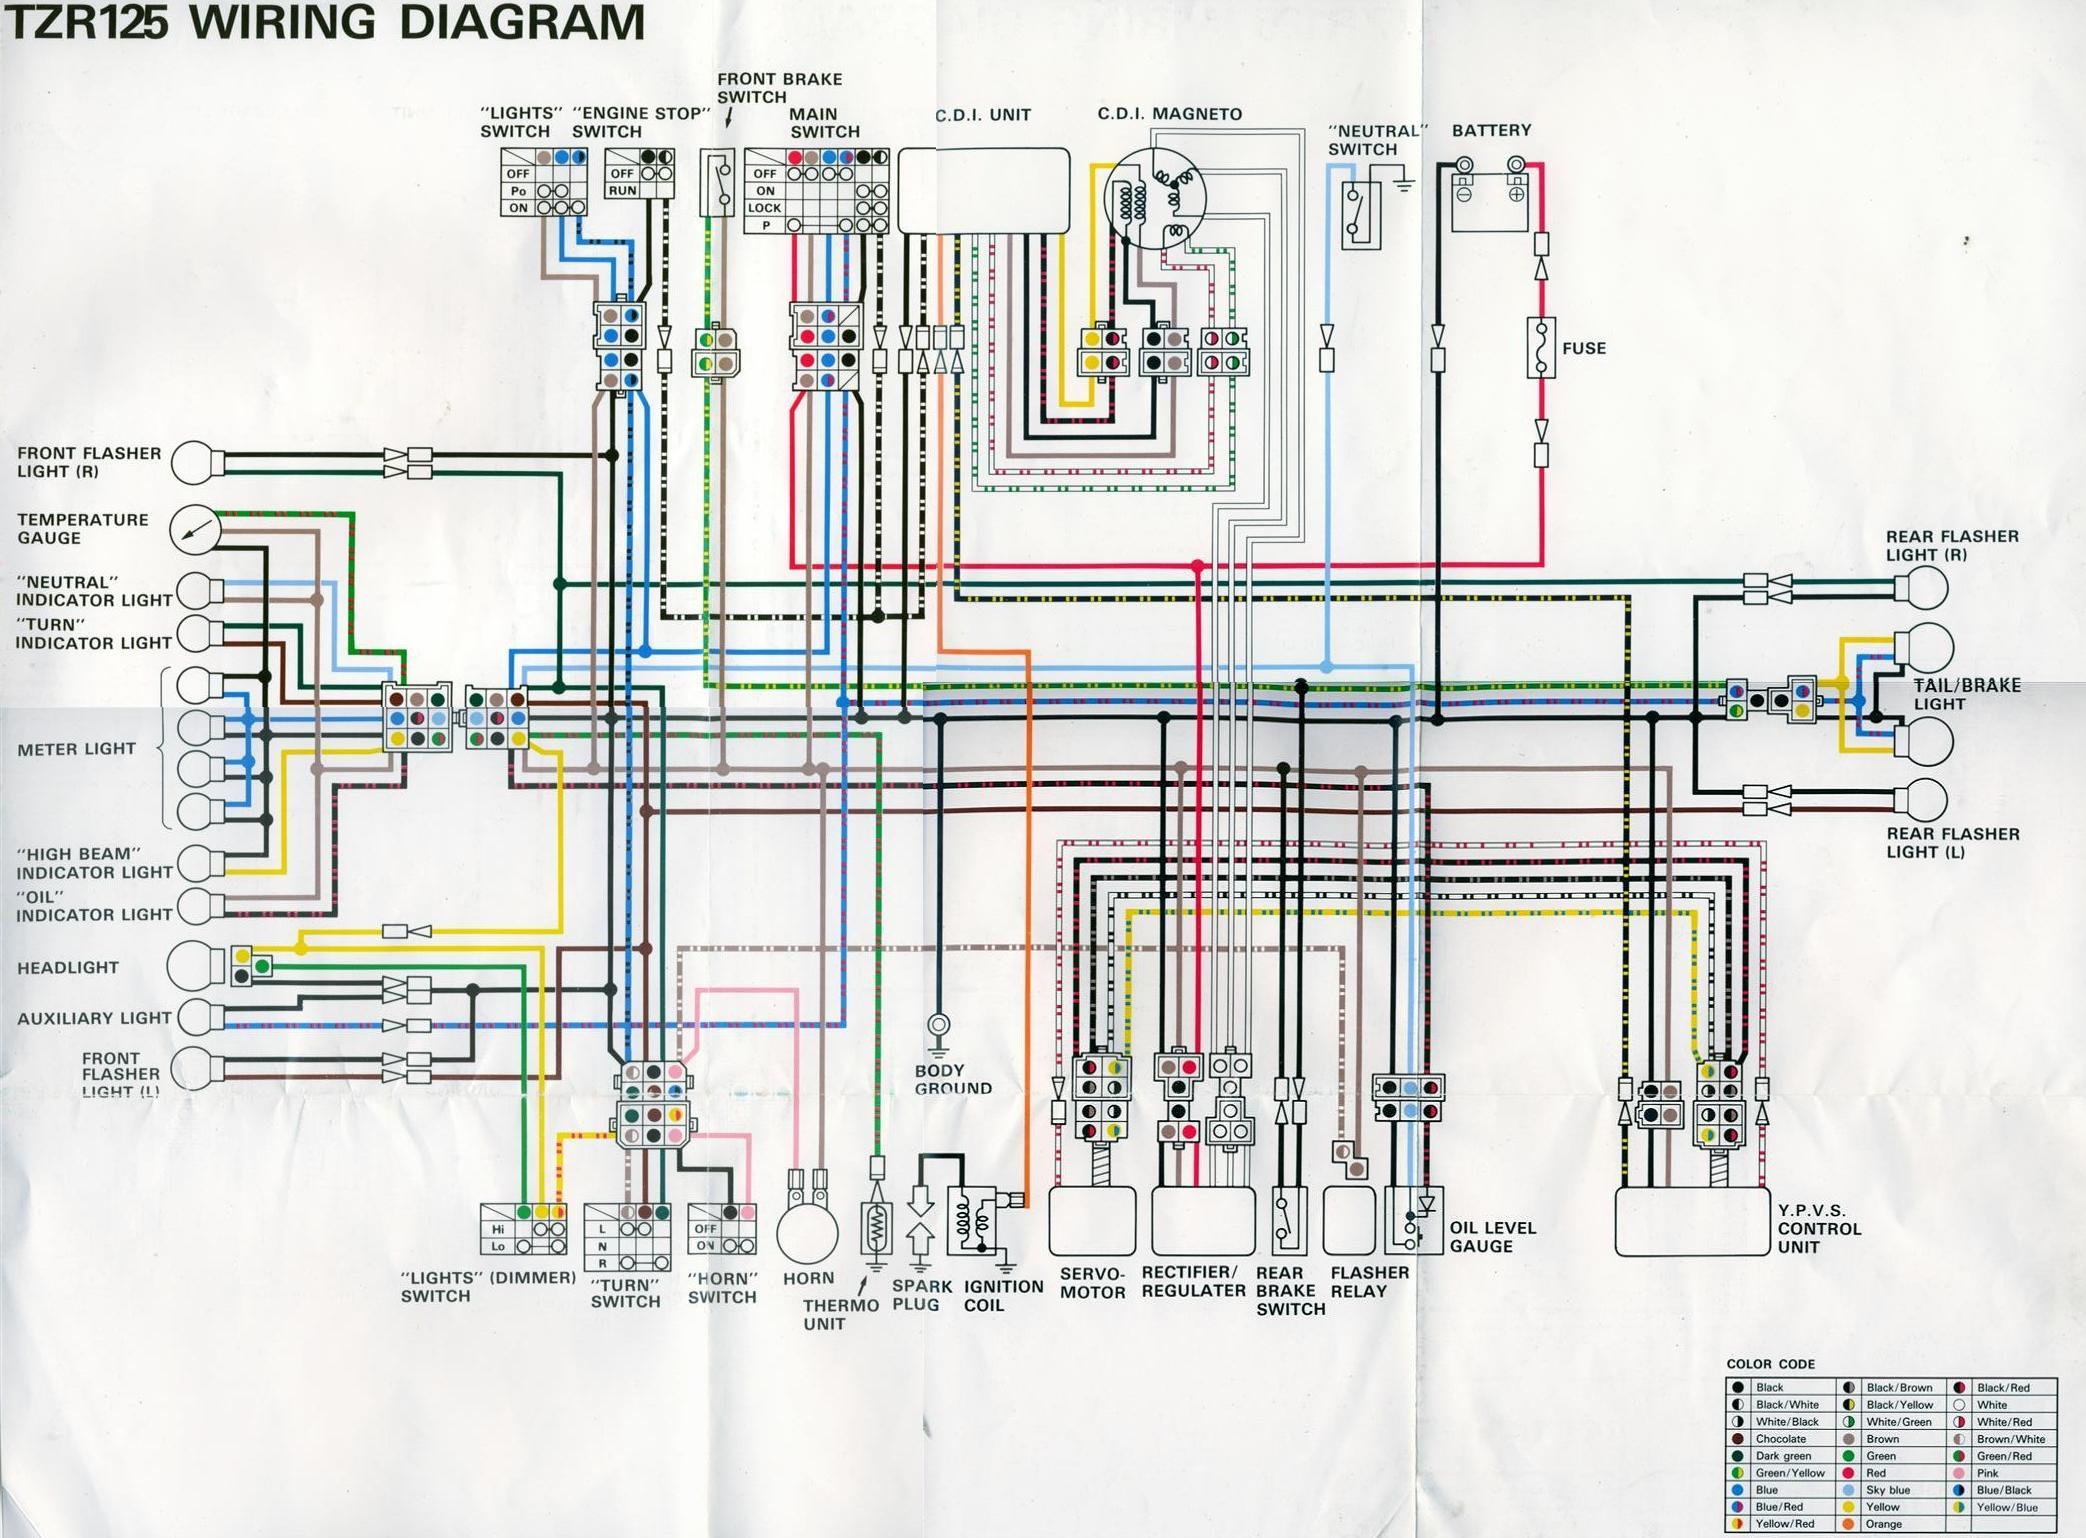 Tao Kick Start Diagram Electrical Wiring Diagrams 50cc Scooter Similiar 2012 Keywords Atv Engine